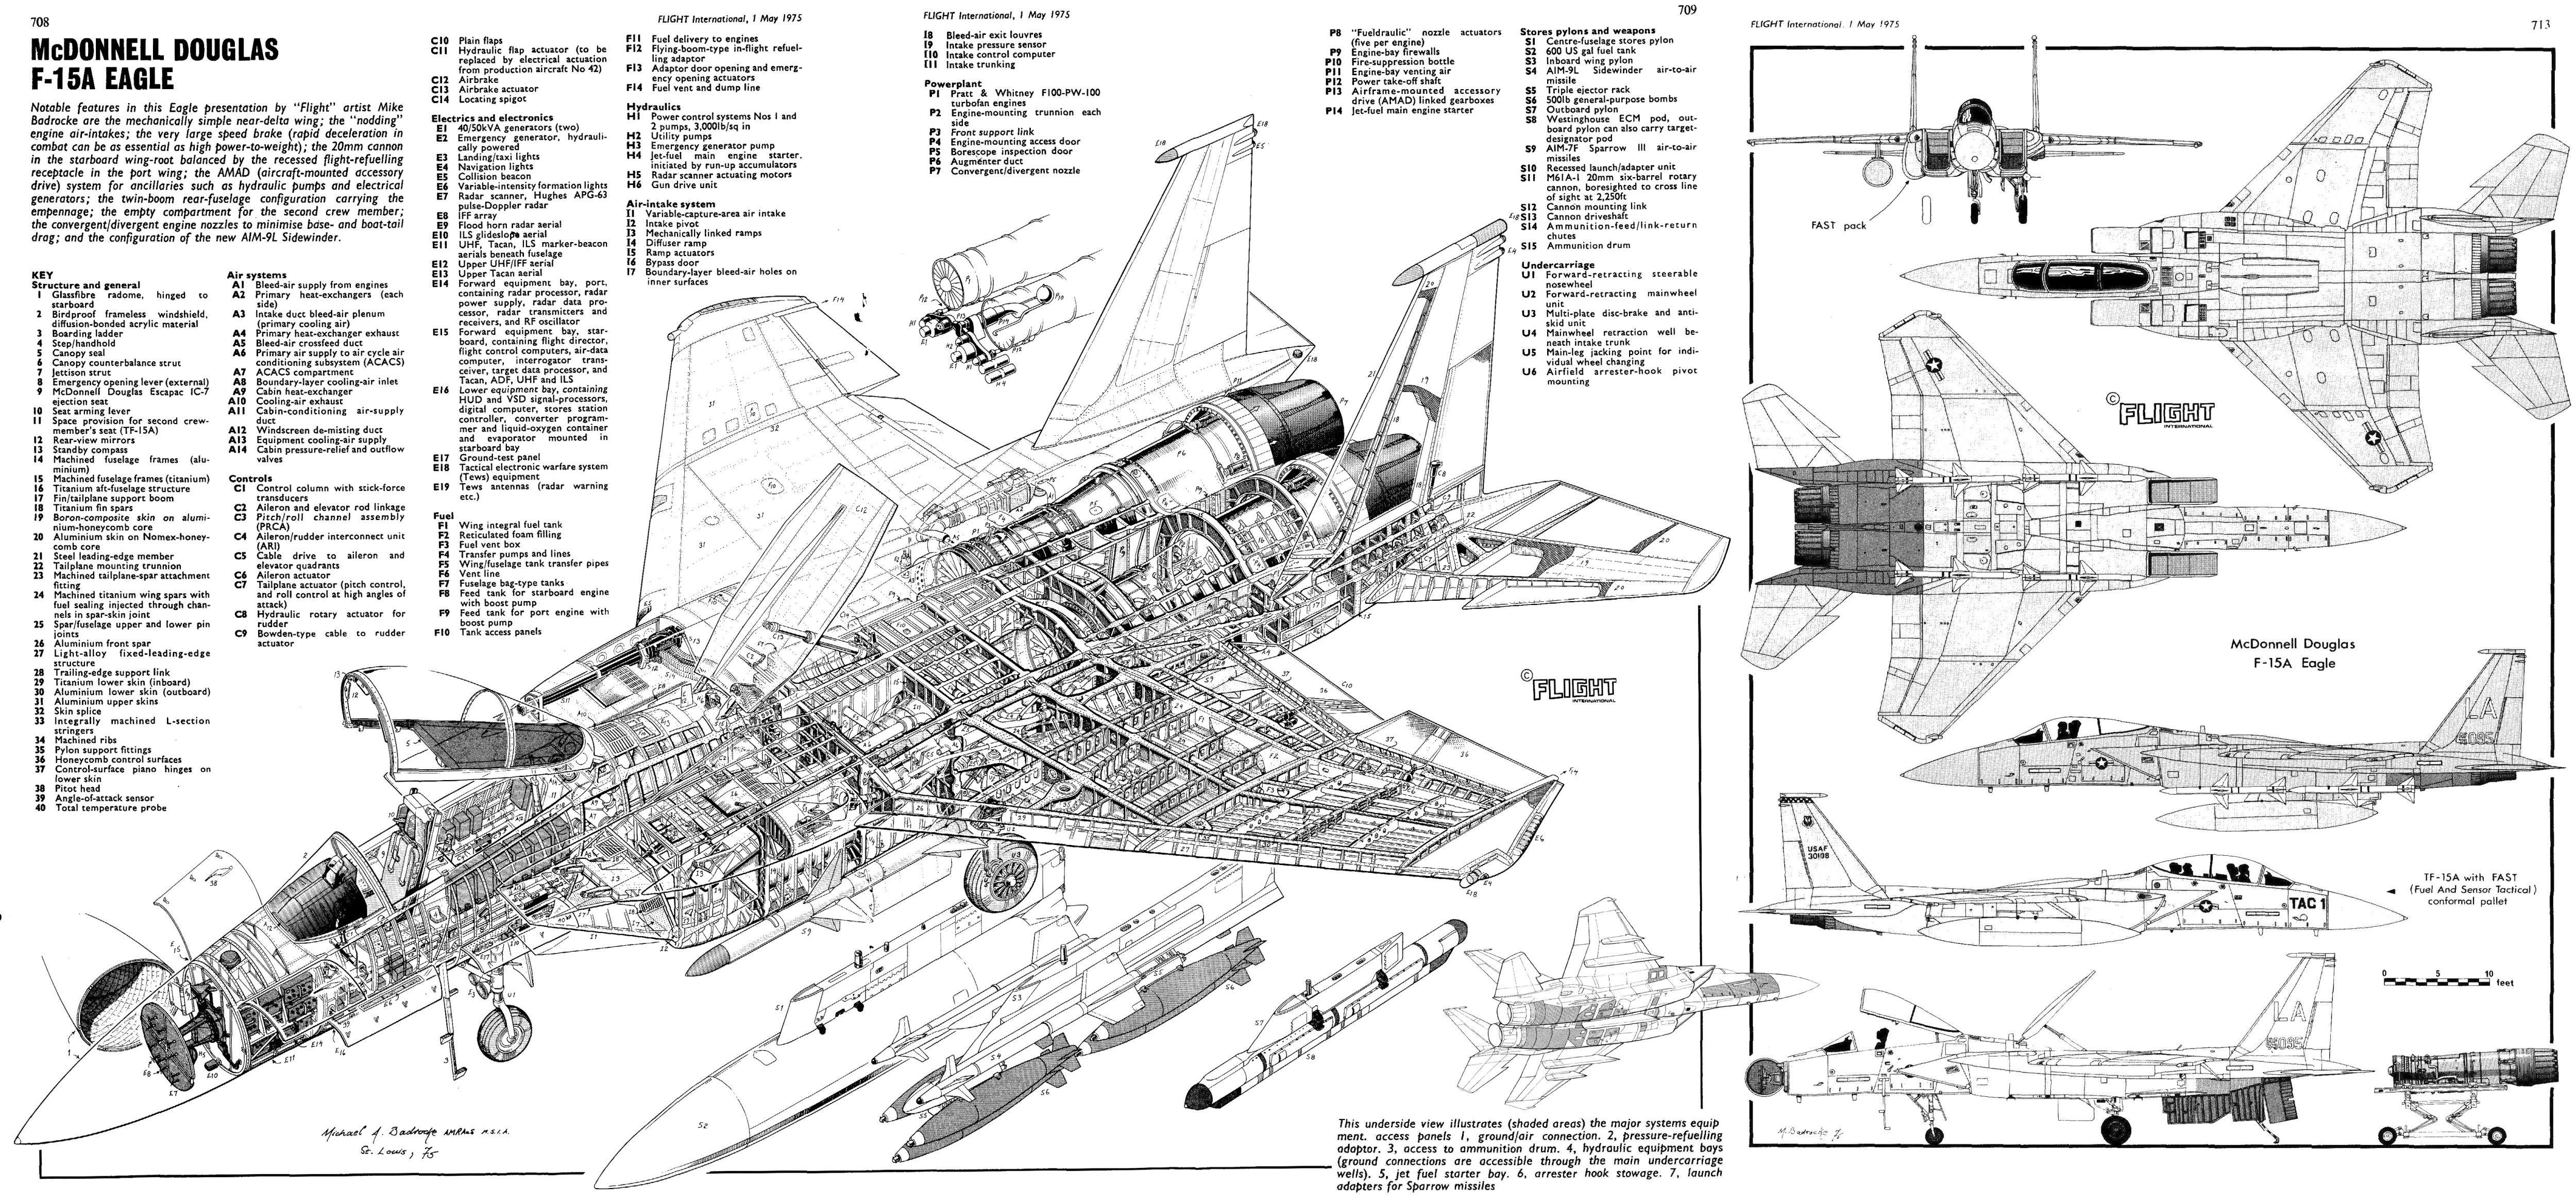 F 15 Eagle Diagram - Wiring Diagram Detailed